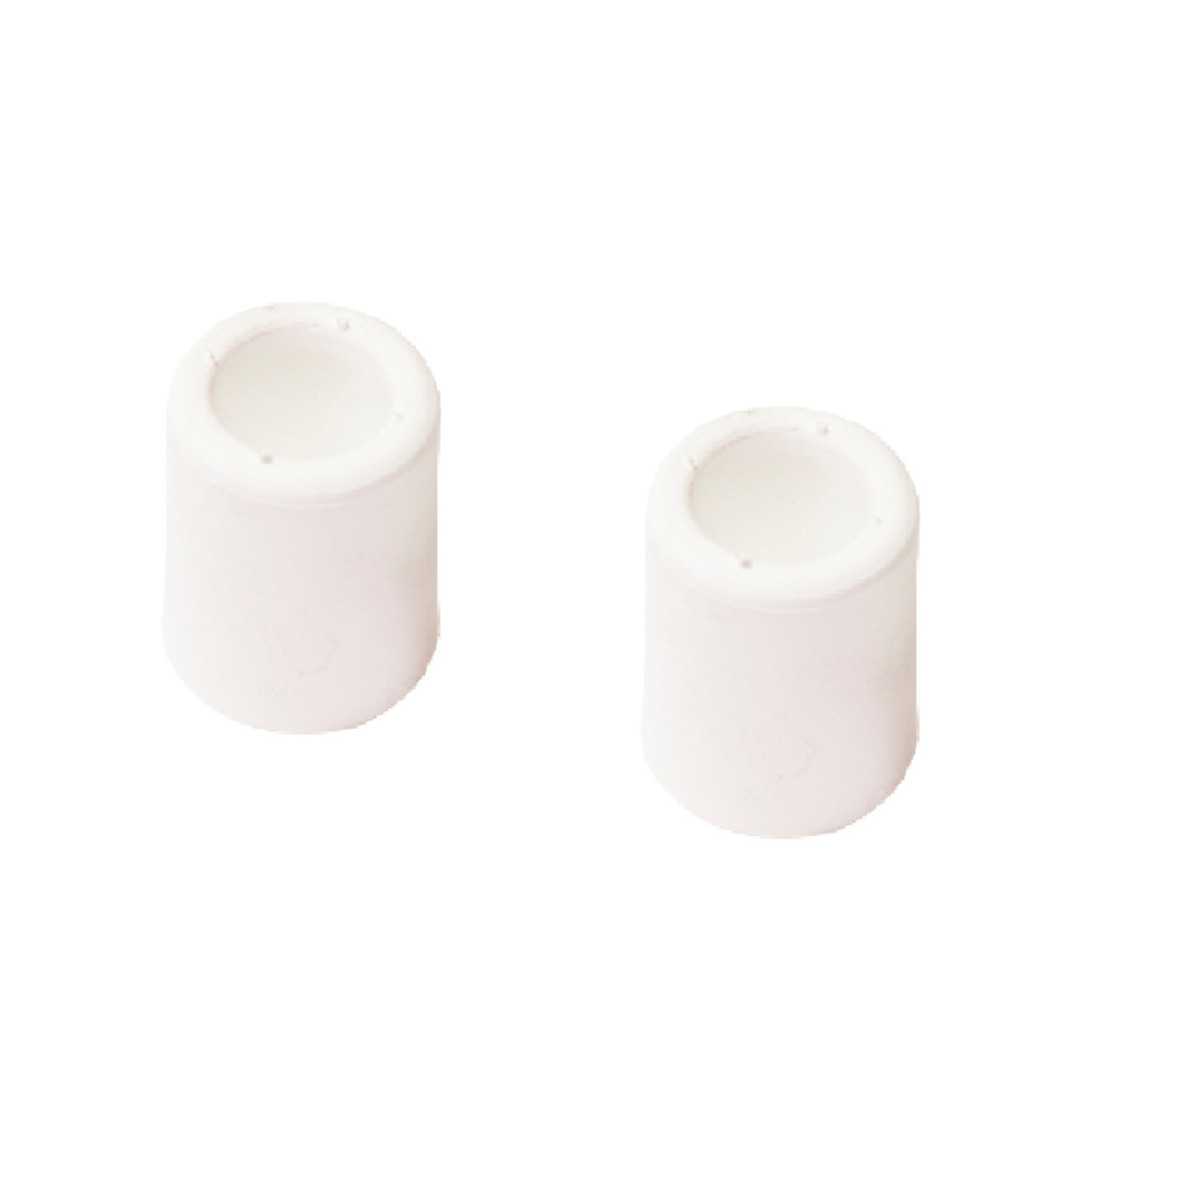 3x stuks deurstopper - deurbuffer rubber wit 60 mm